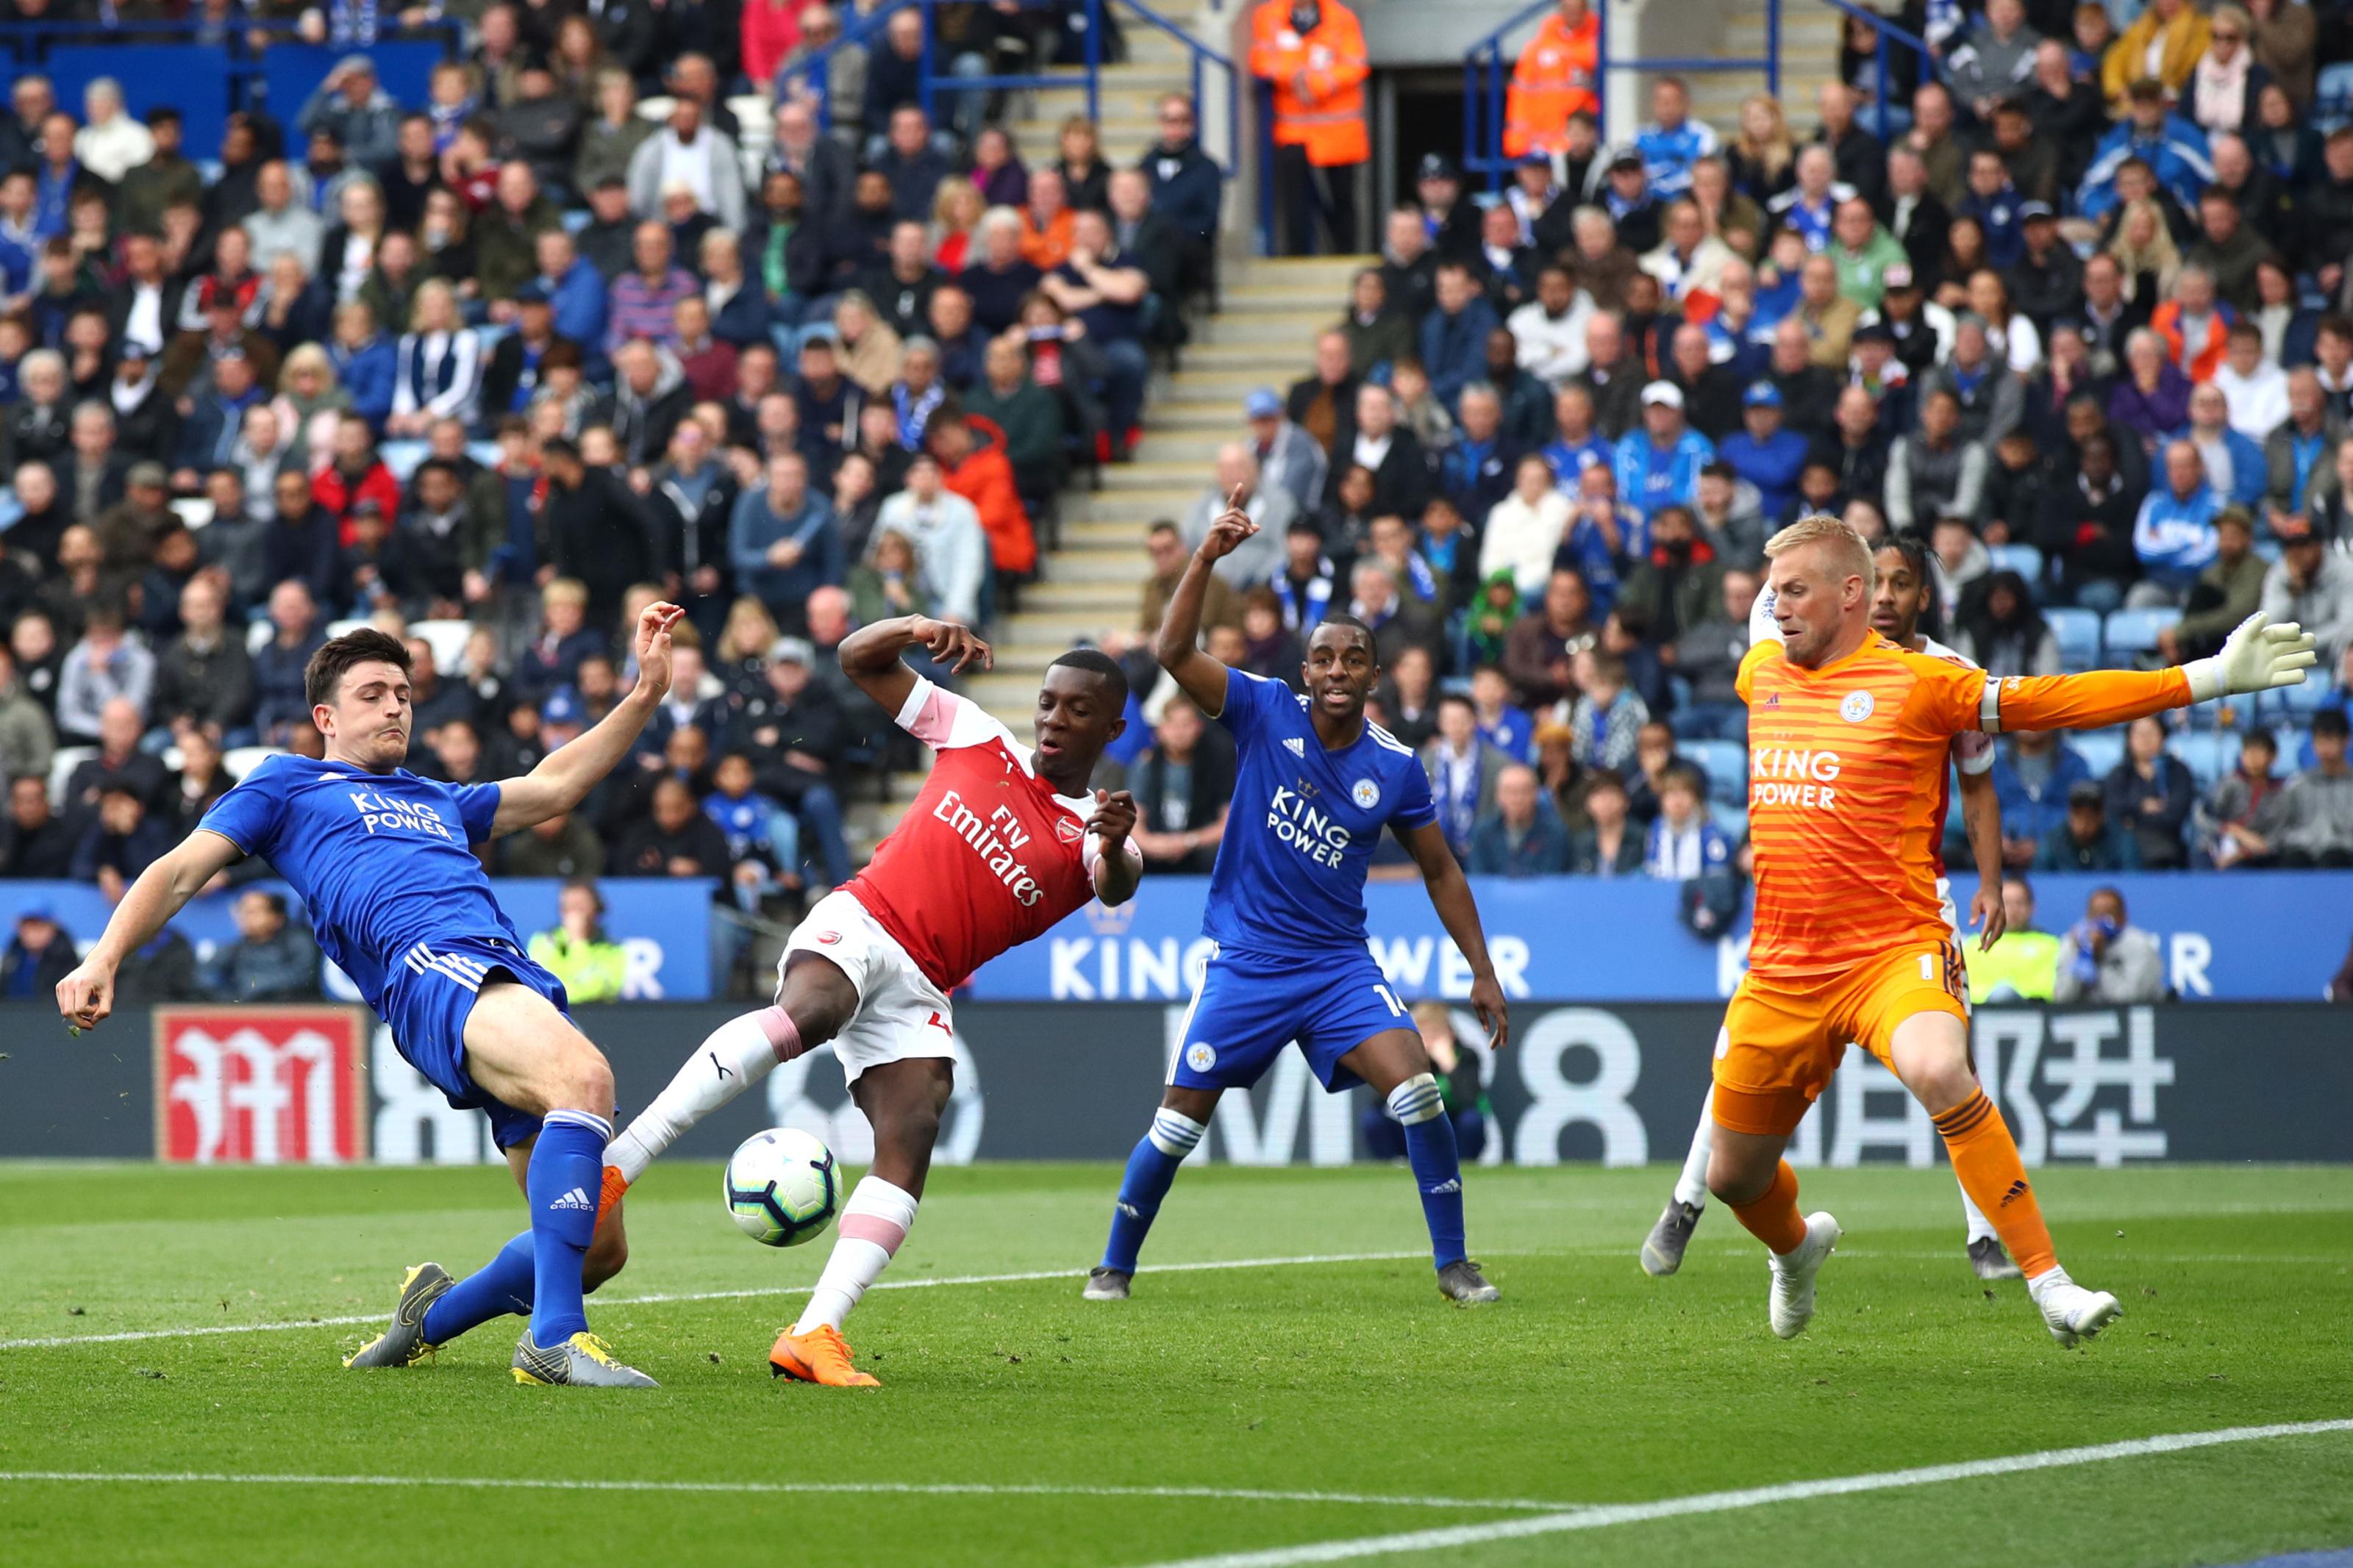 Arsenal Vs Burnley: Eddie Nketiah, this is your shot